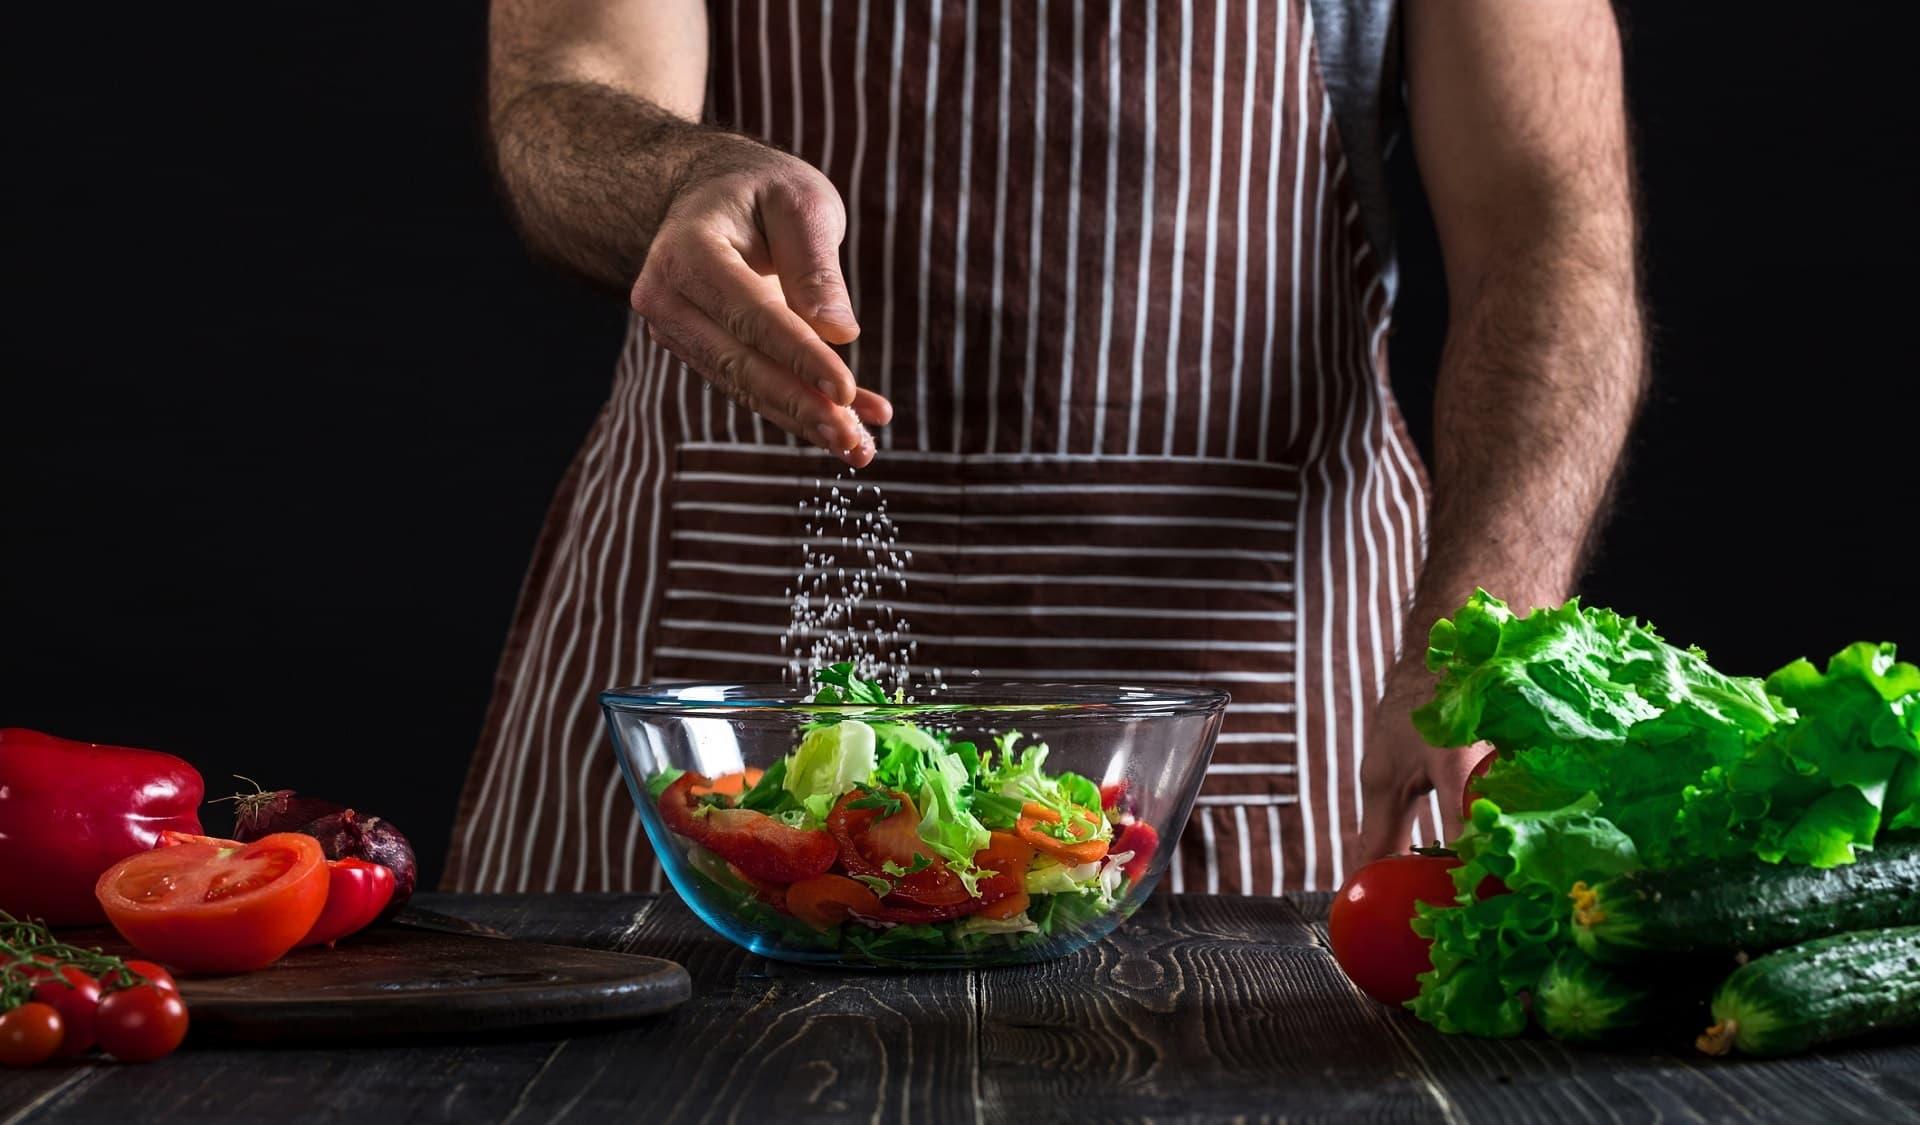 Kräutersalz auf Salat